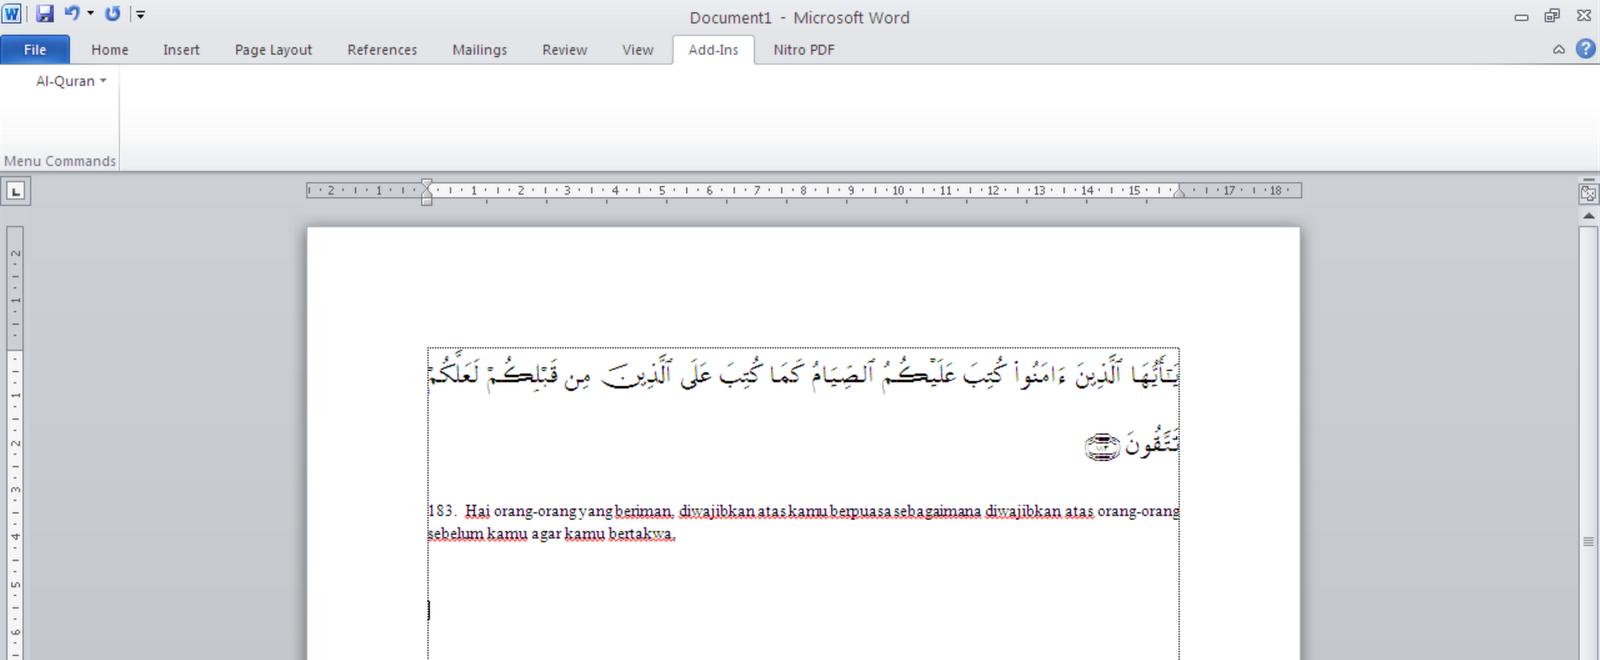 free download software al quran in word 2010